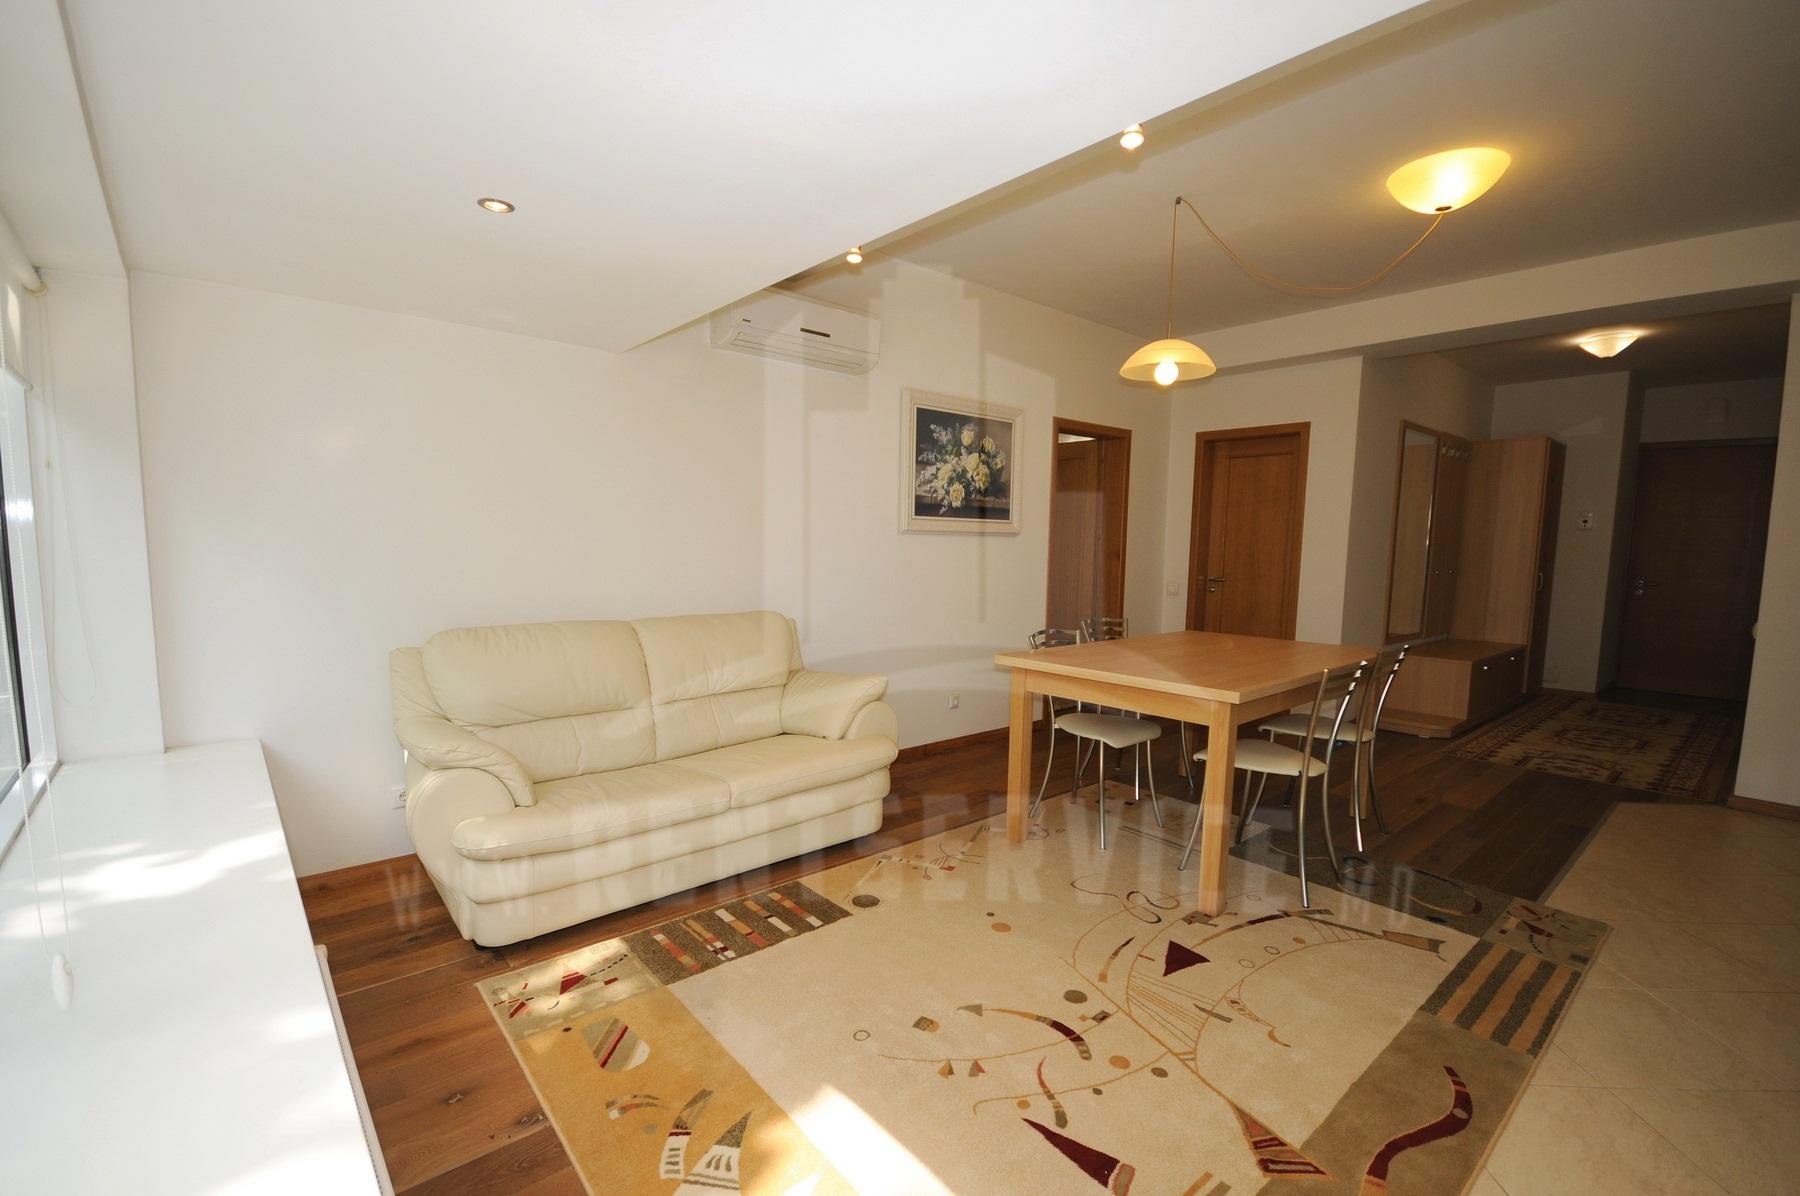 267_apartment_9.JPG